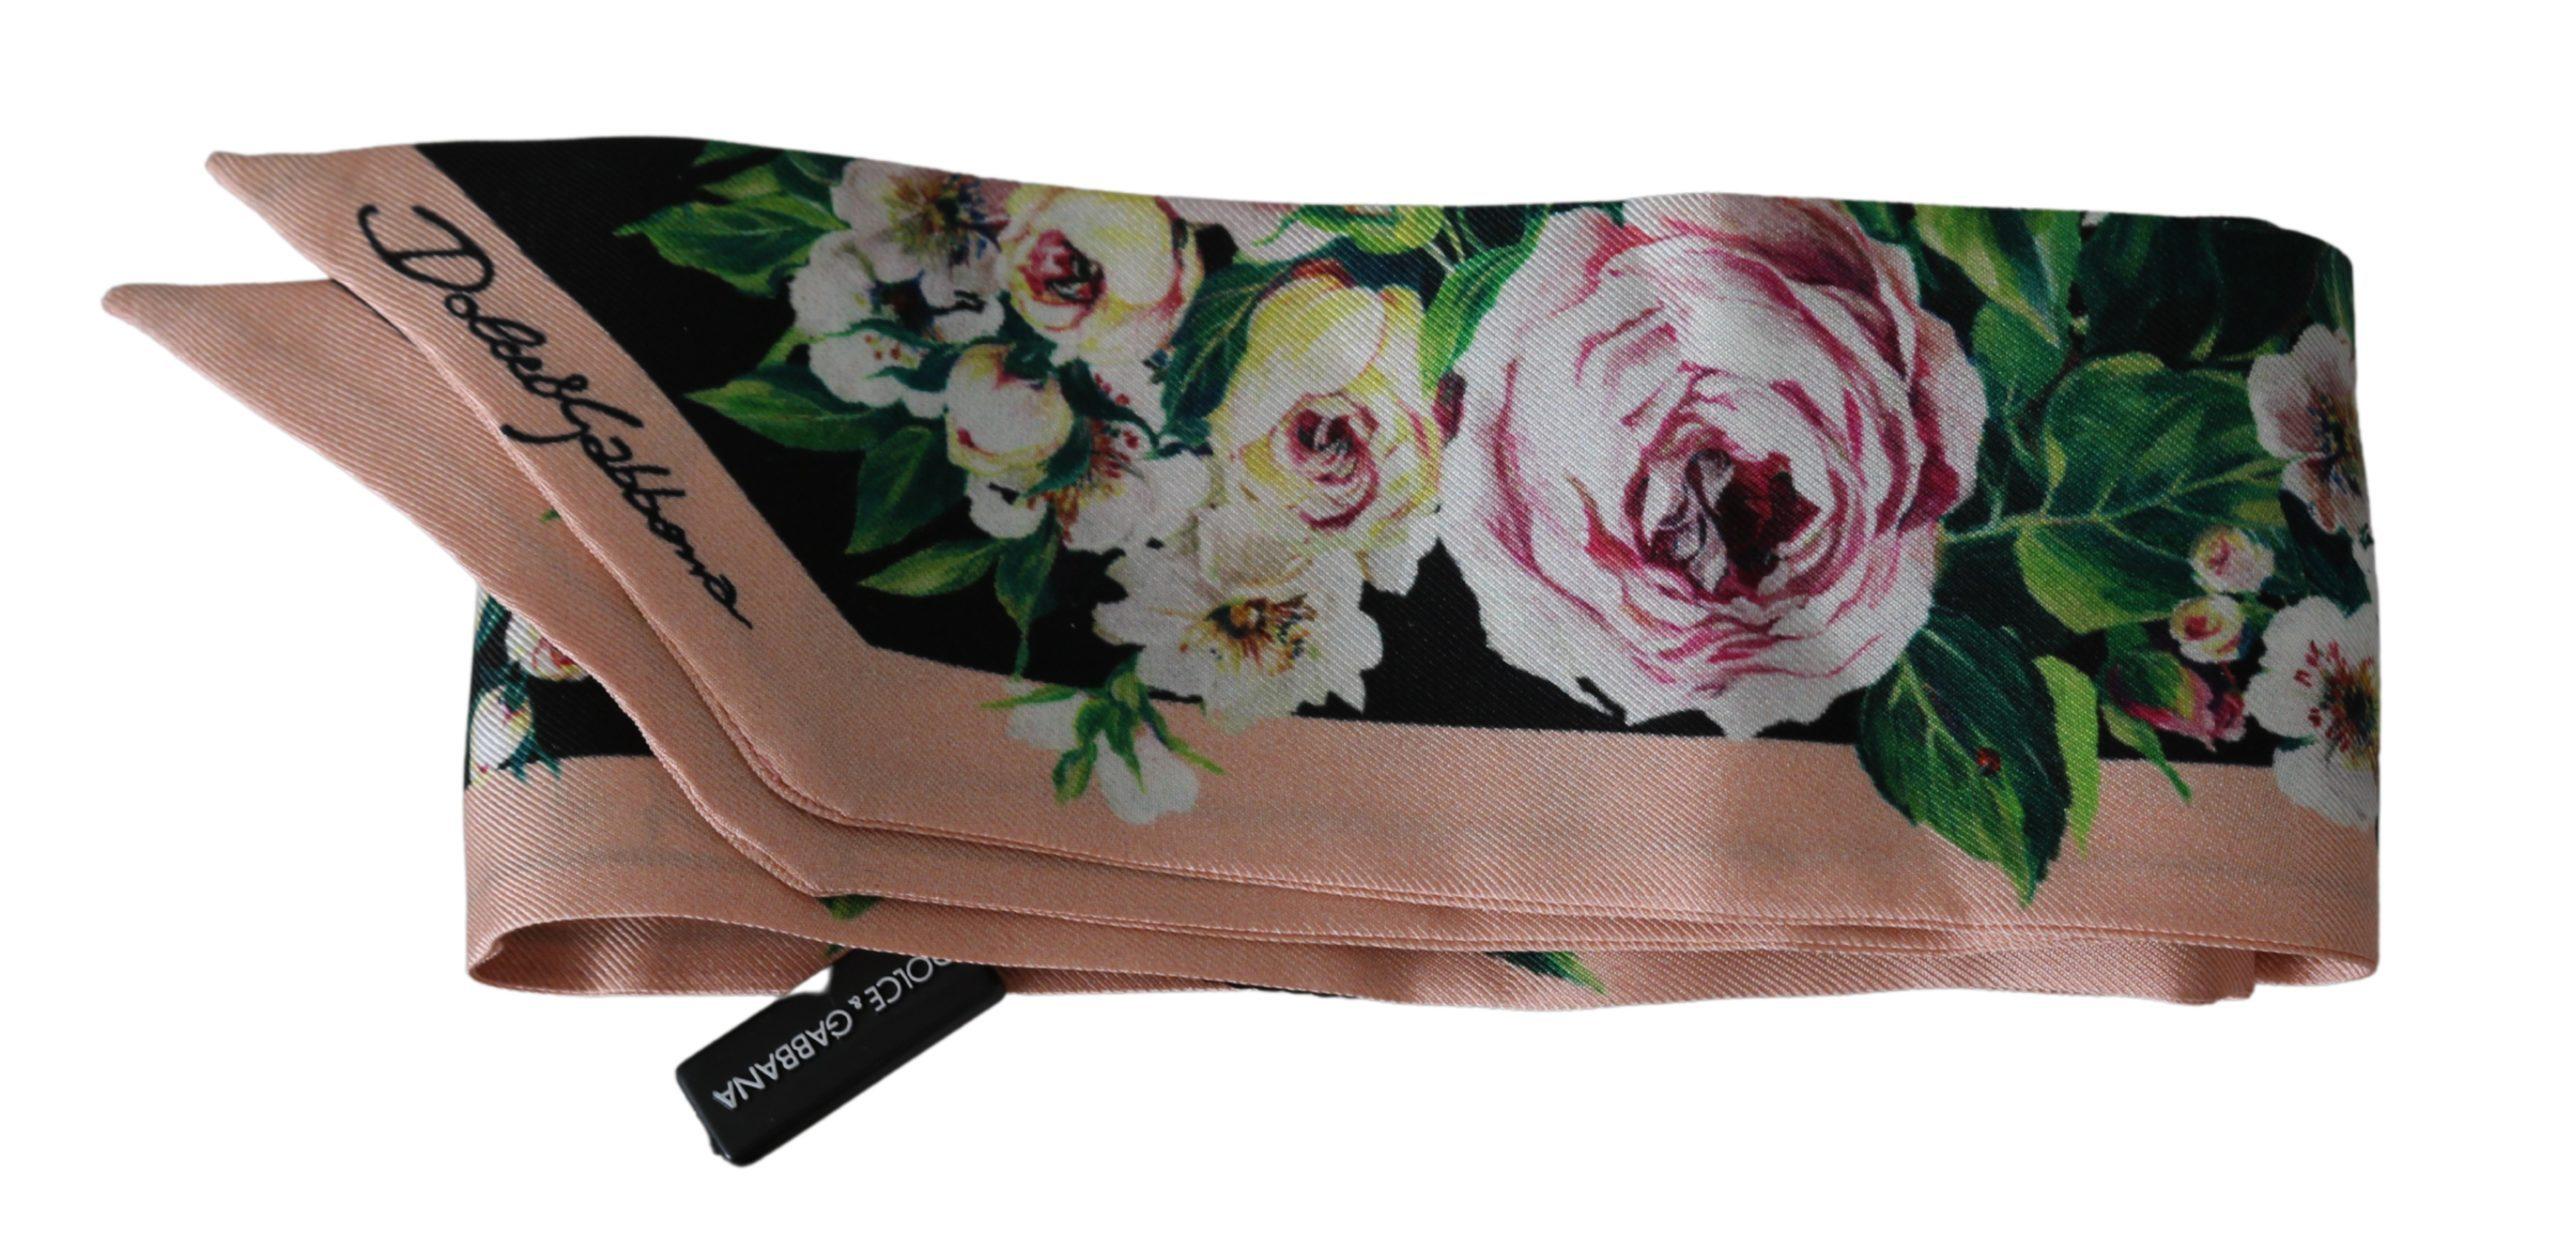 Dolce & Gabbana Women's Silk Necktie Bandeau Scarf Multicolor MS1722BG